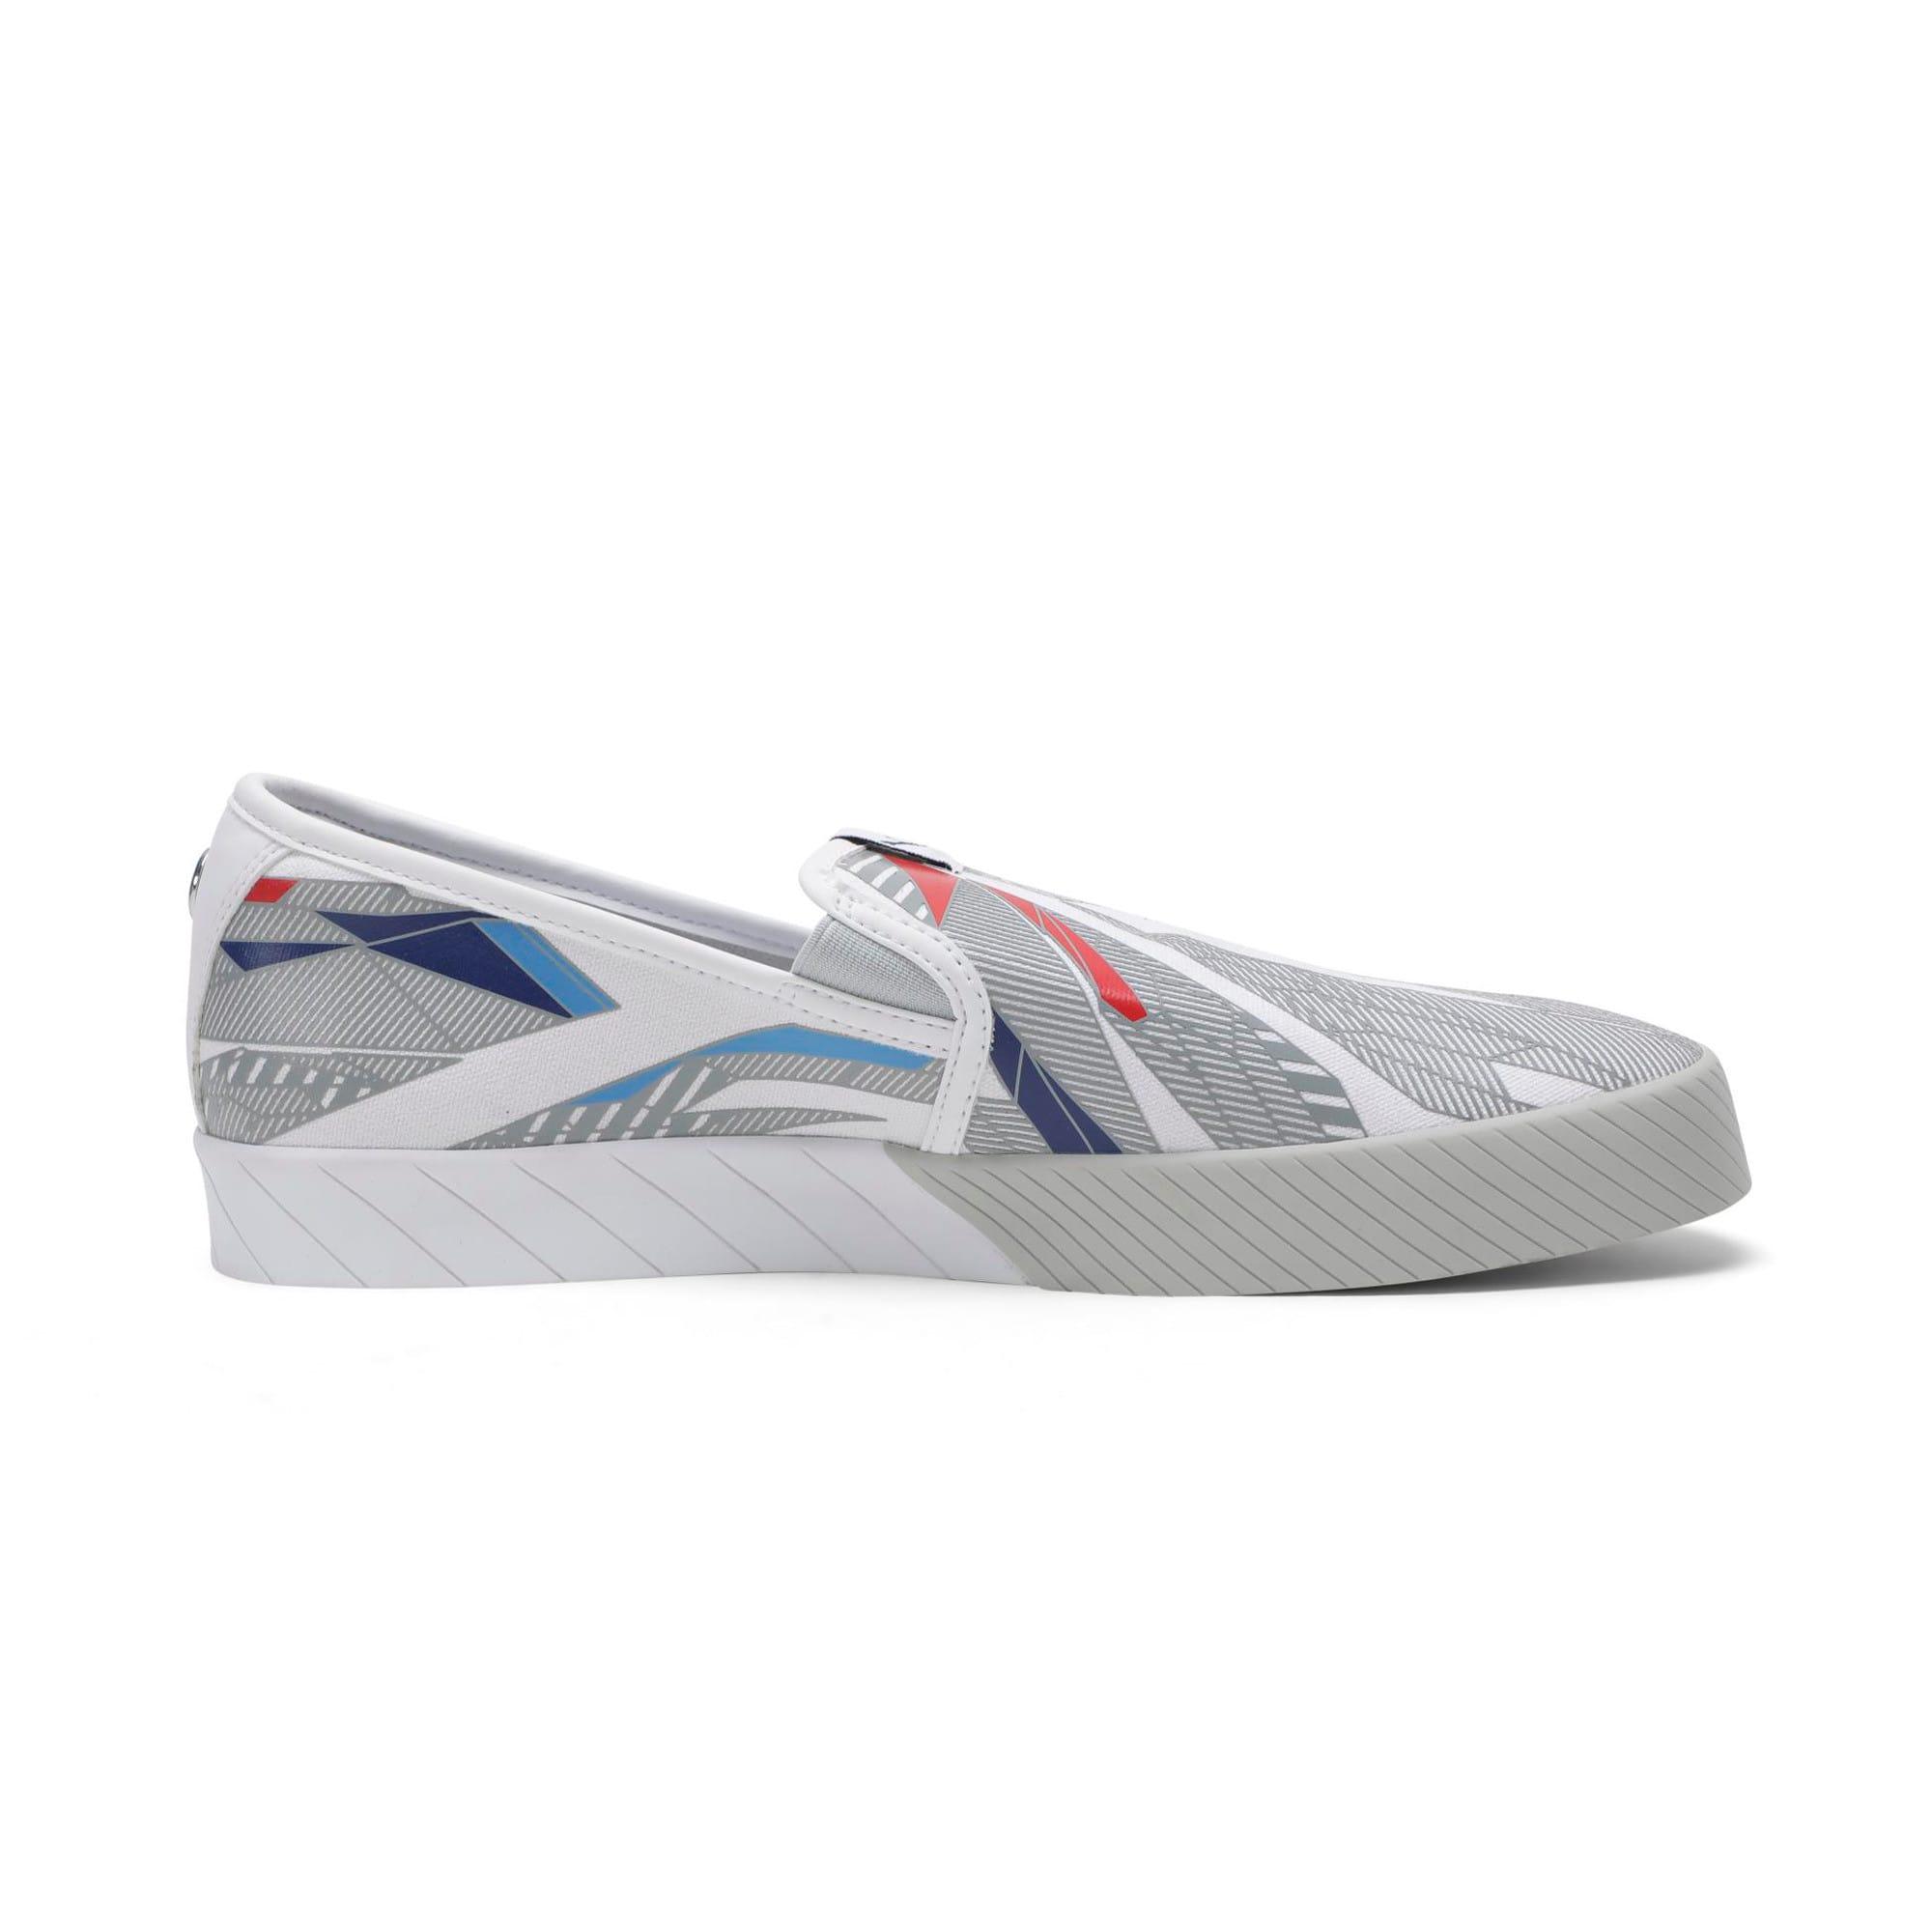 Thumbnail 7 of BMW M Slip-On Track Shoes, Puma White-Gray Violet, medium-IND